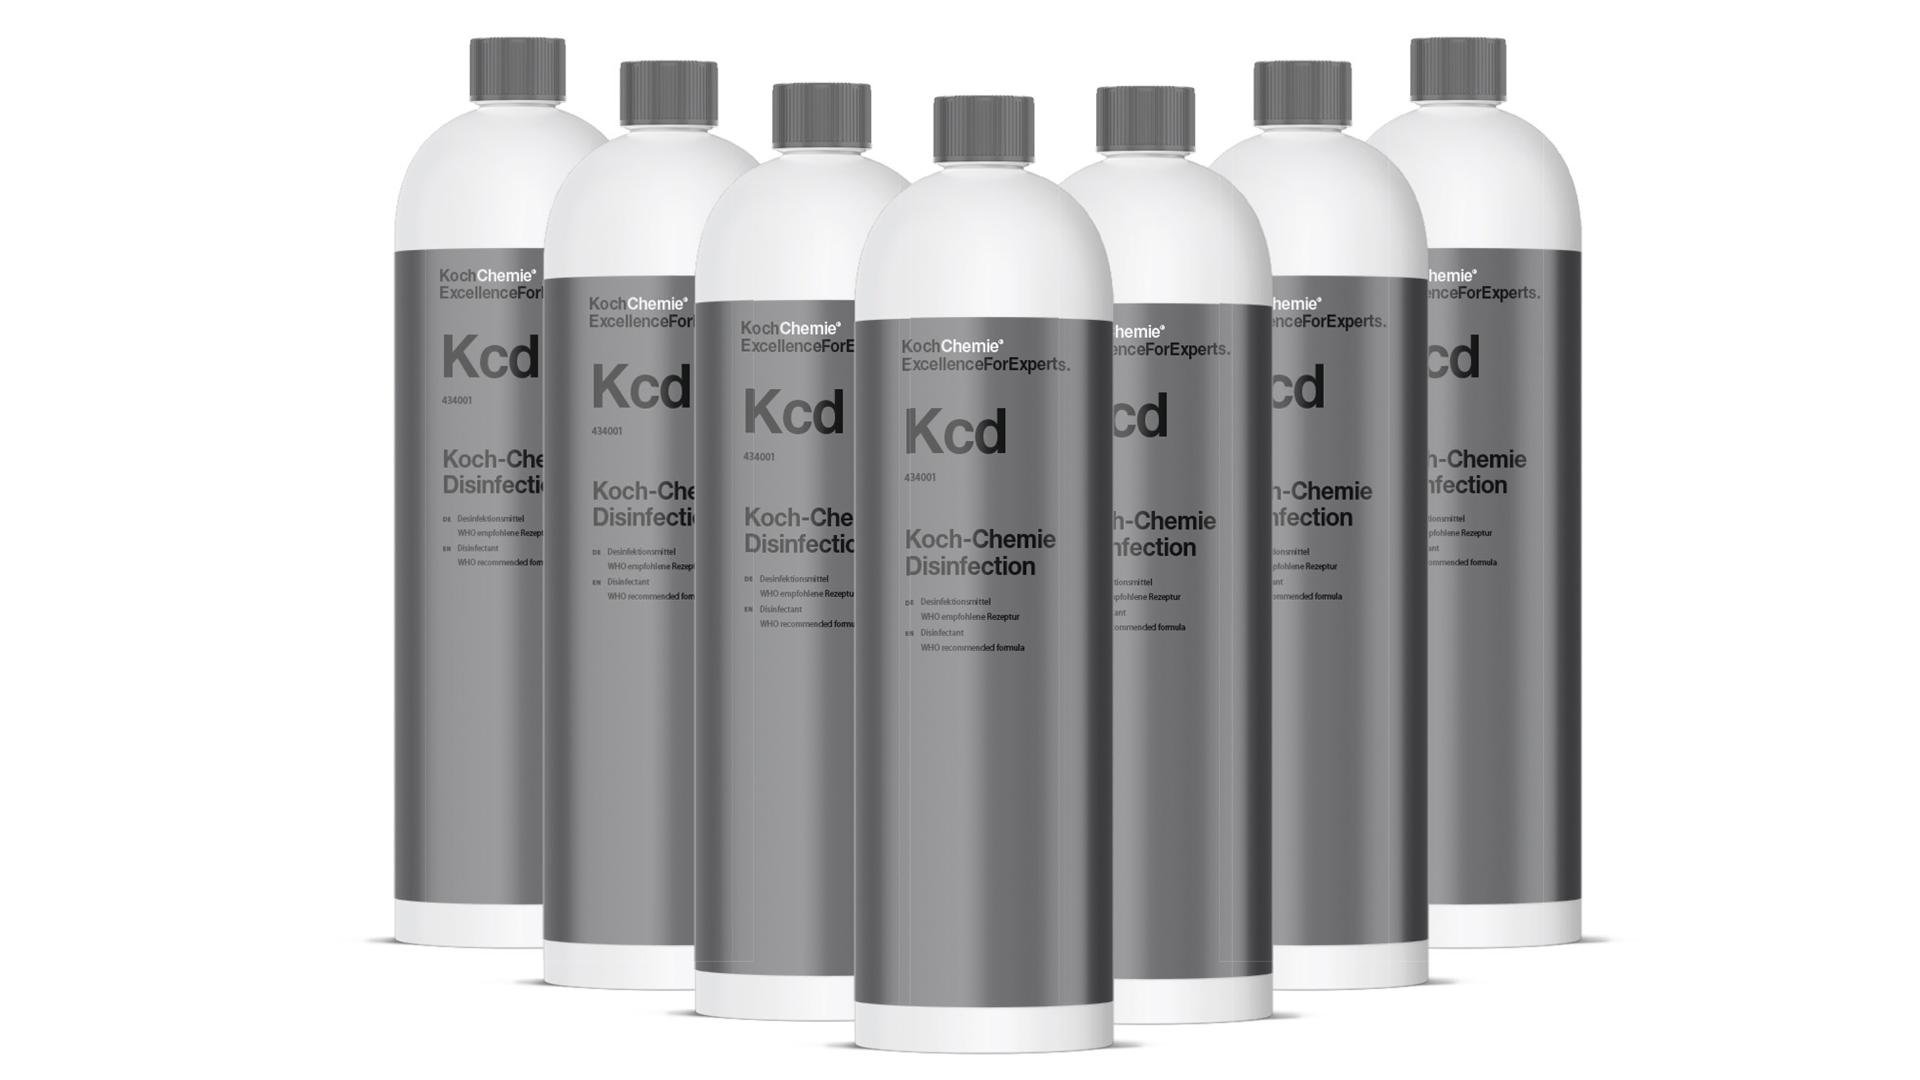 Zubehör: Desinfektionsmittel Koch-Chemie Disinfection Kcd